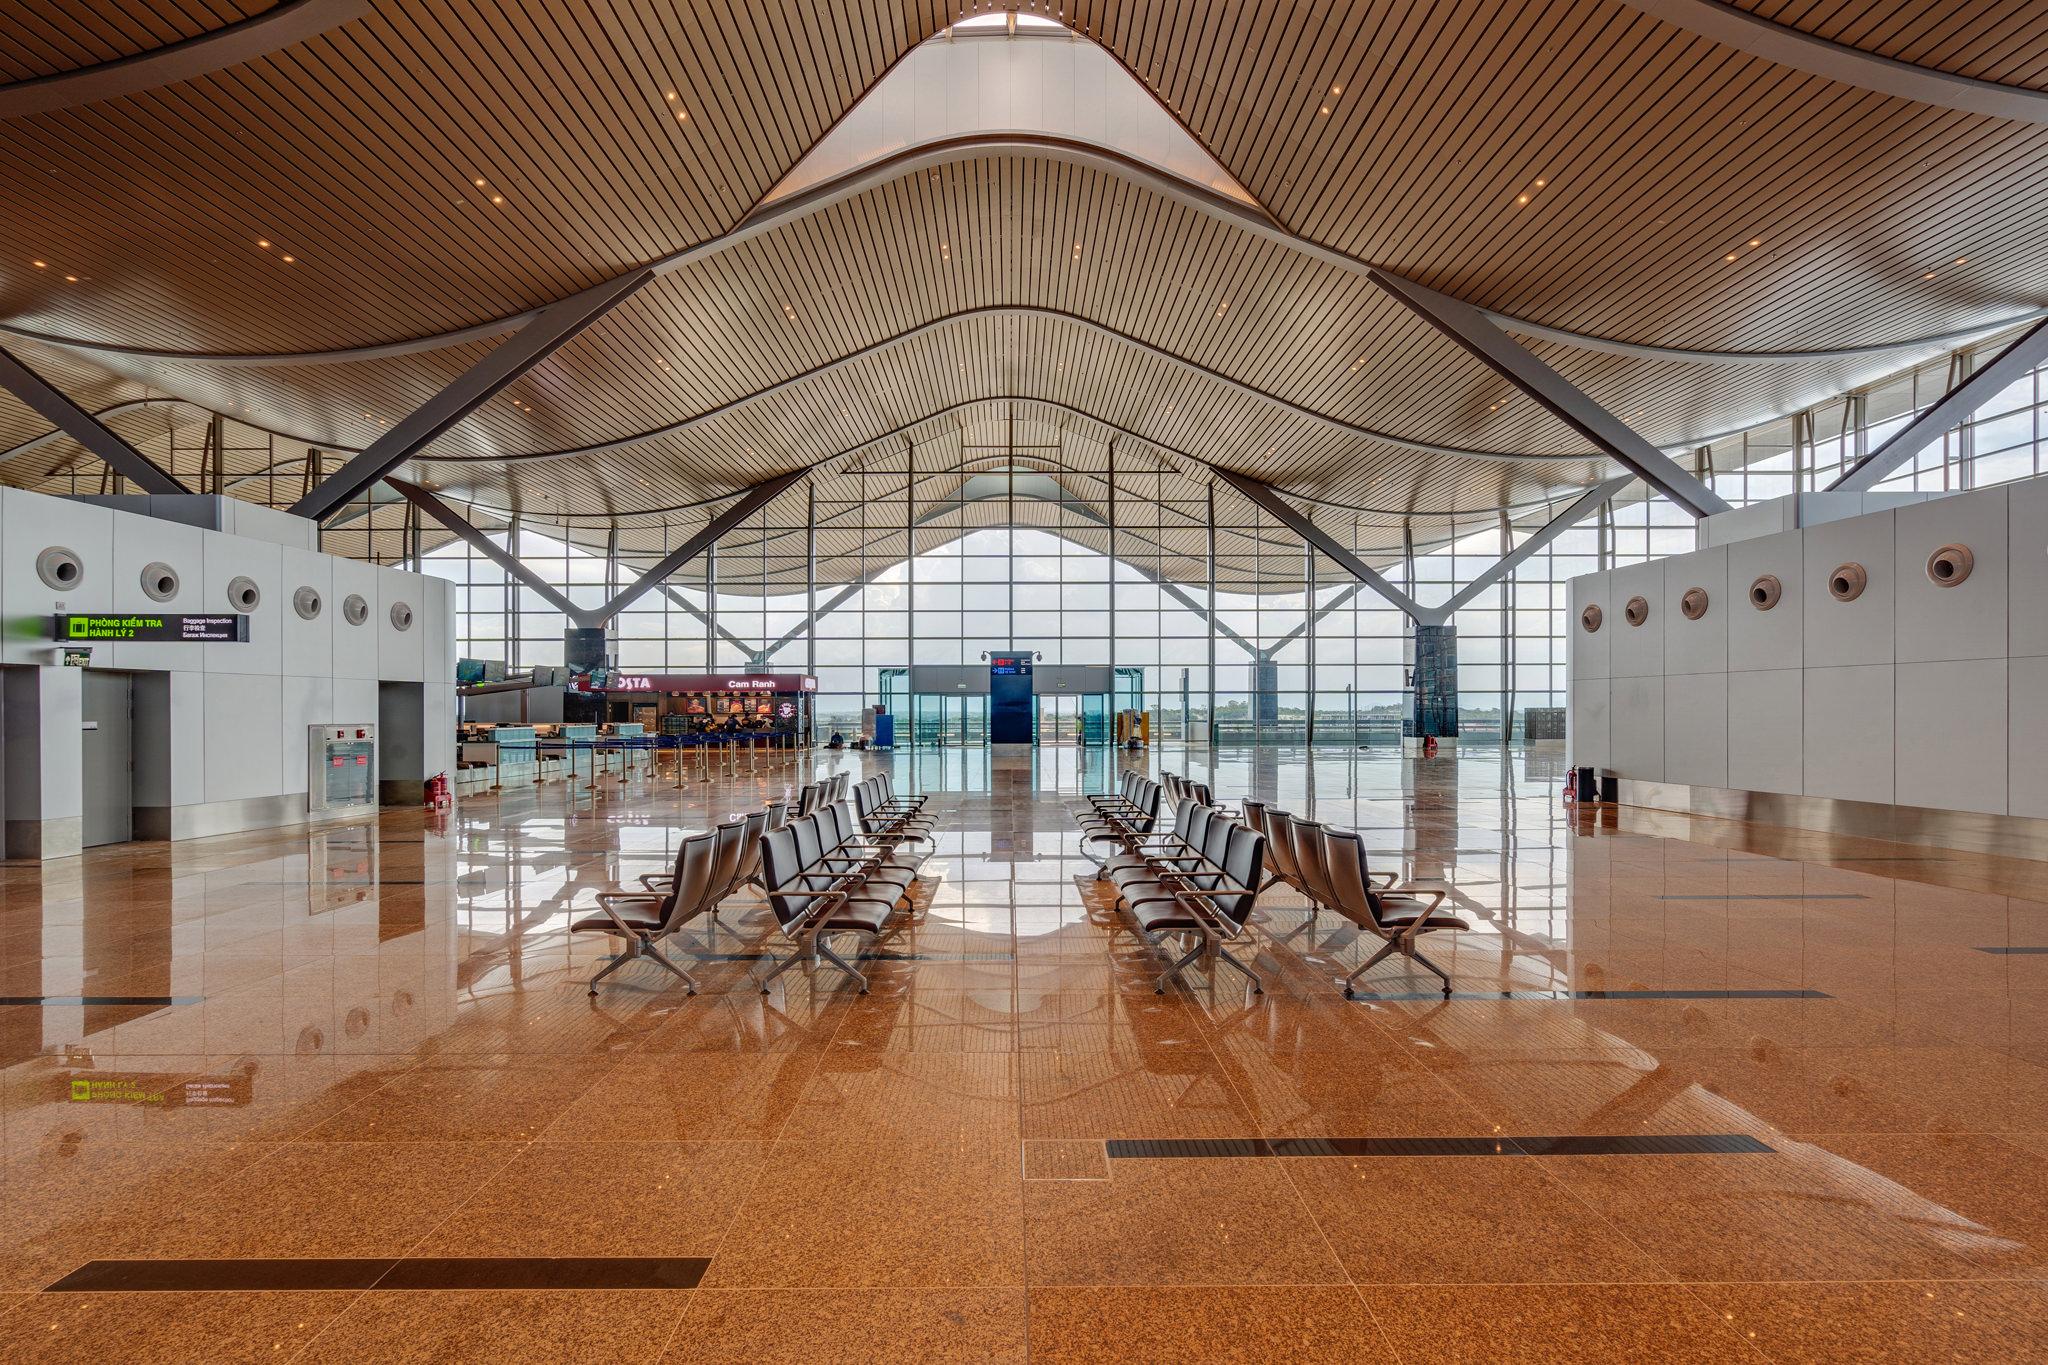 20180626 - Cam Ranh Airport - Architecture - 0325.jpg